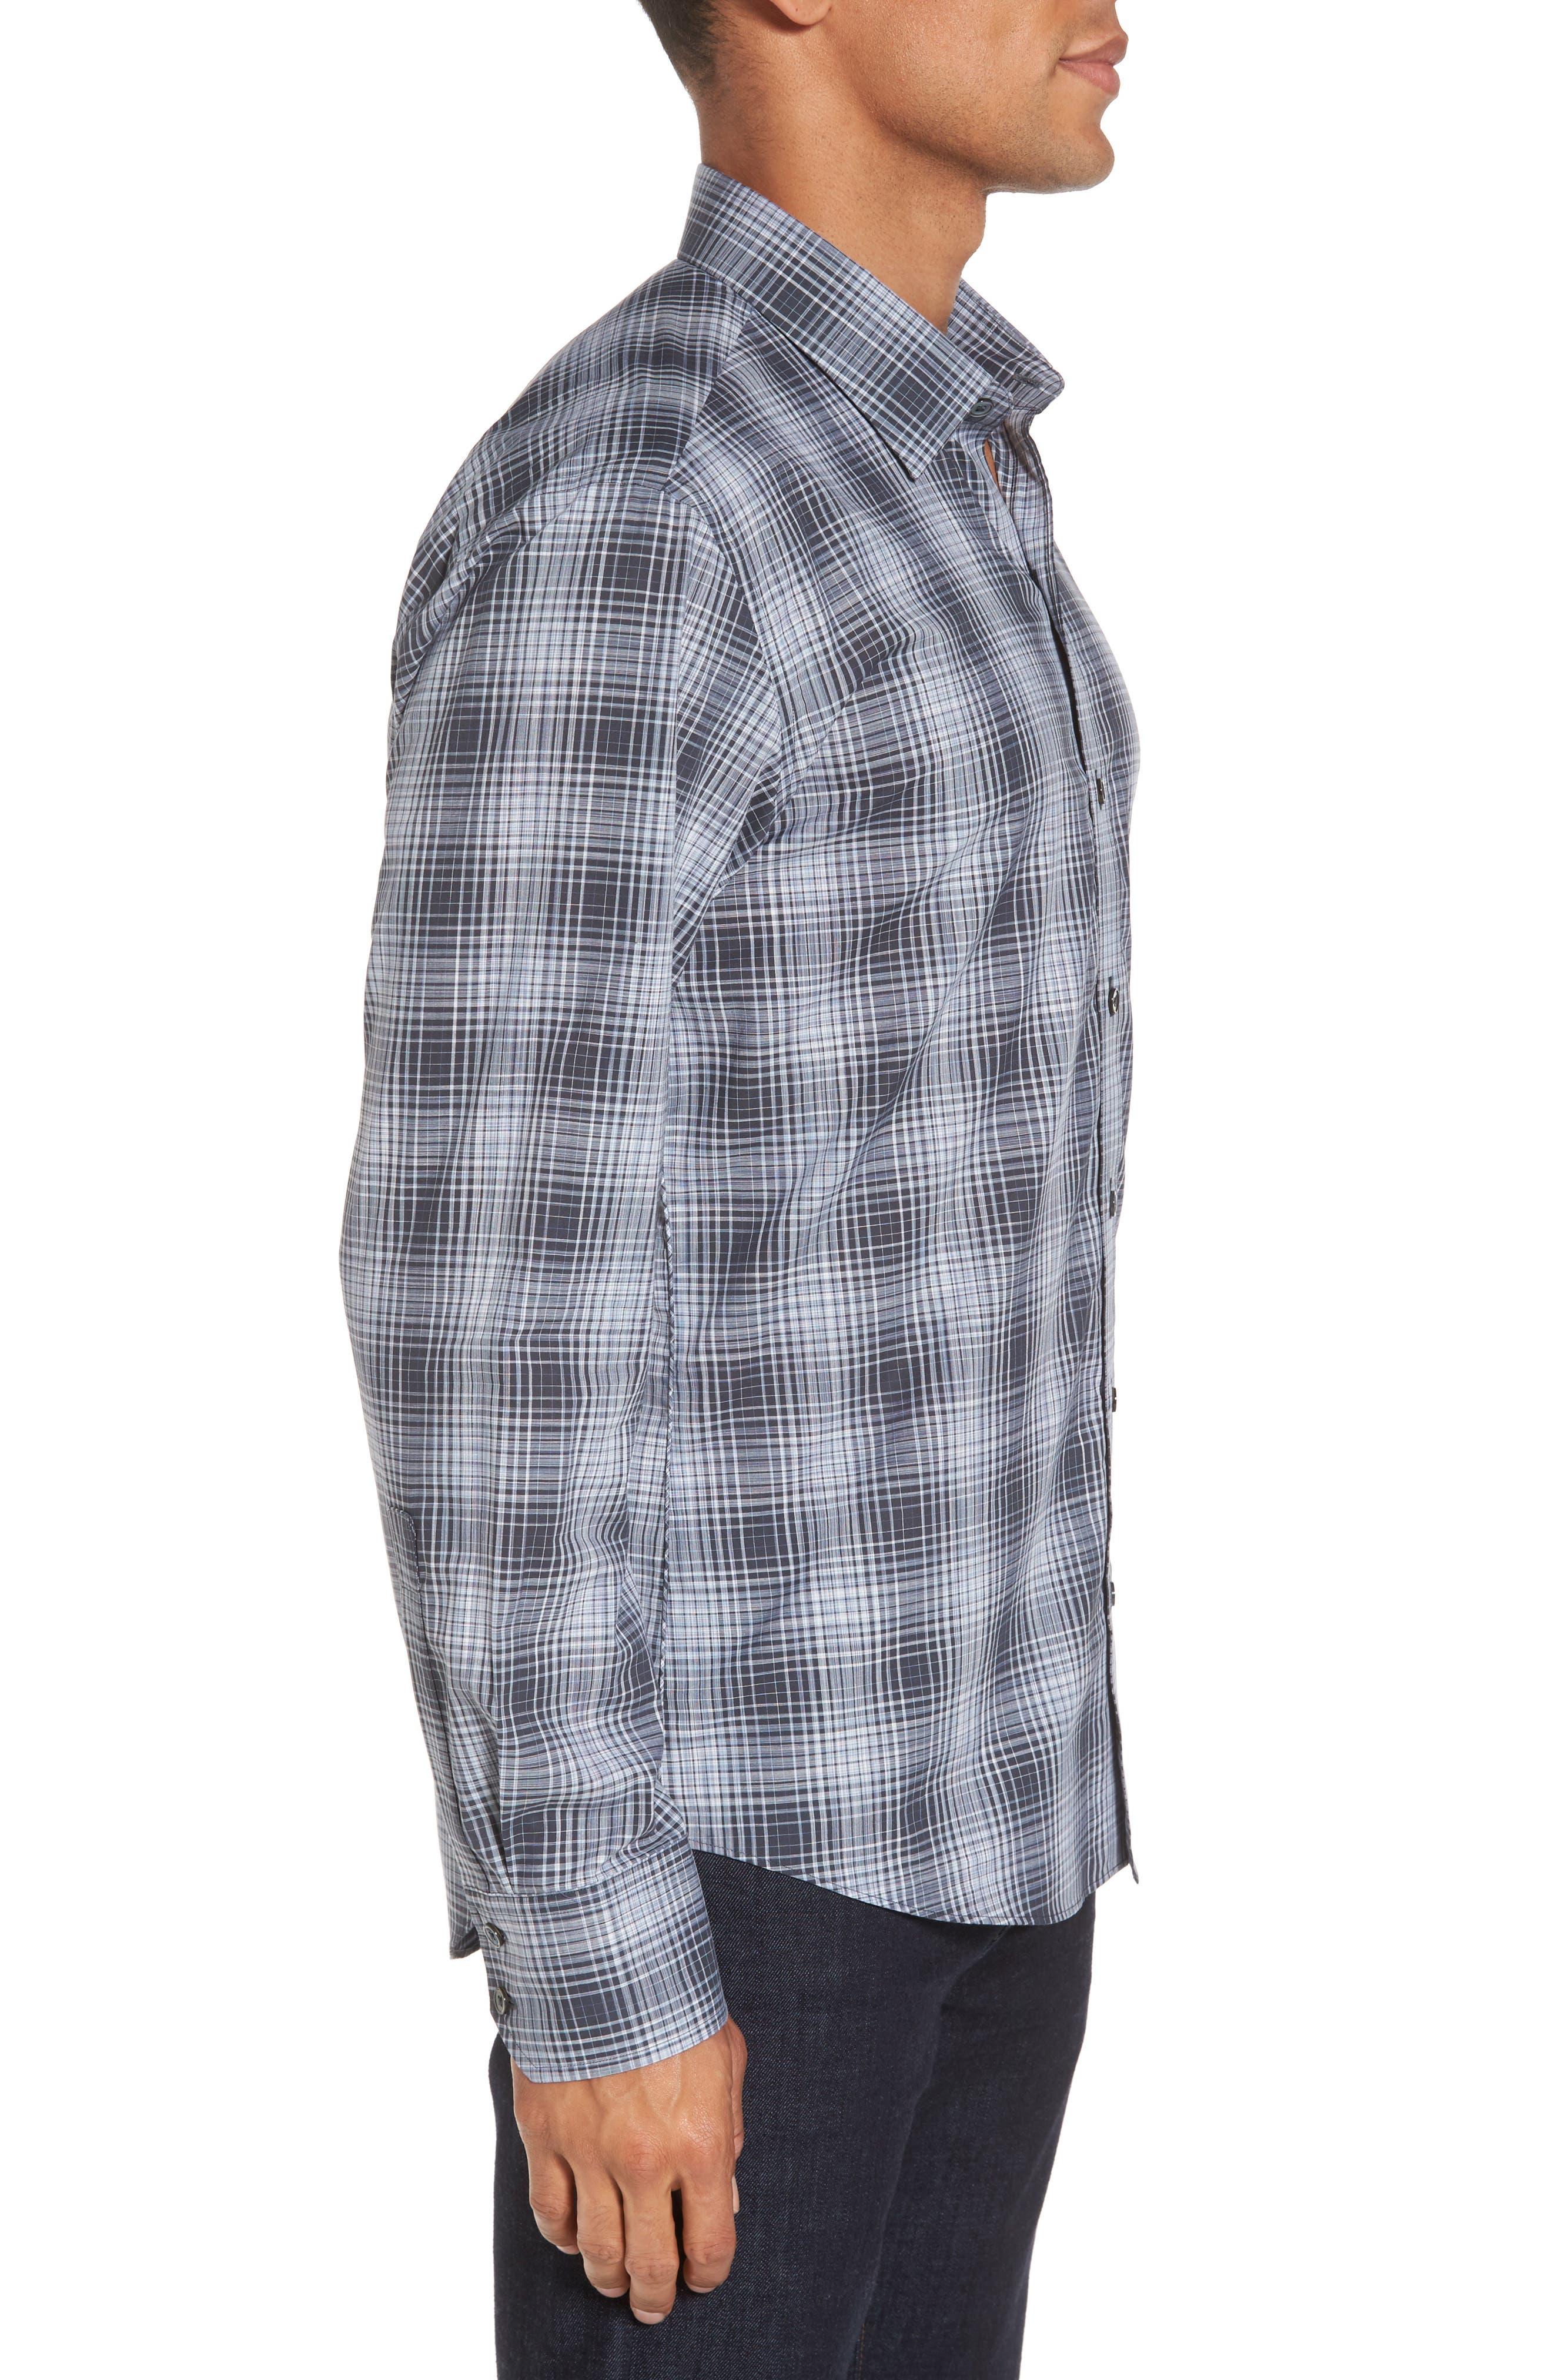 Zander Check Sport Shirt,                             Alternate thumbnail 3, color,                             Dark Grey